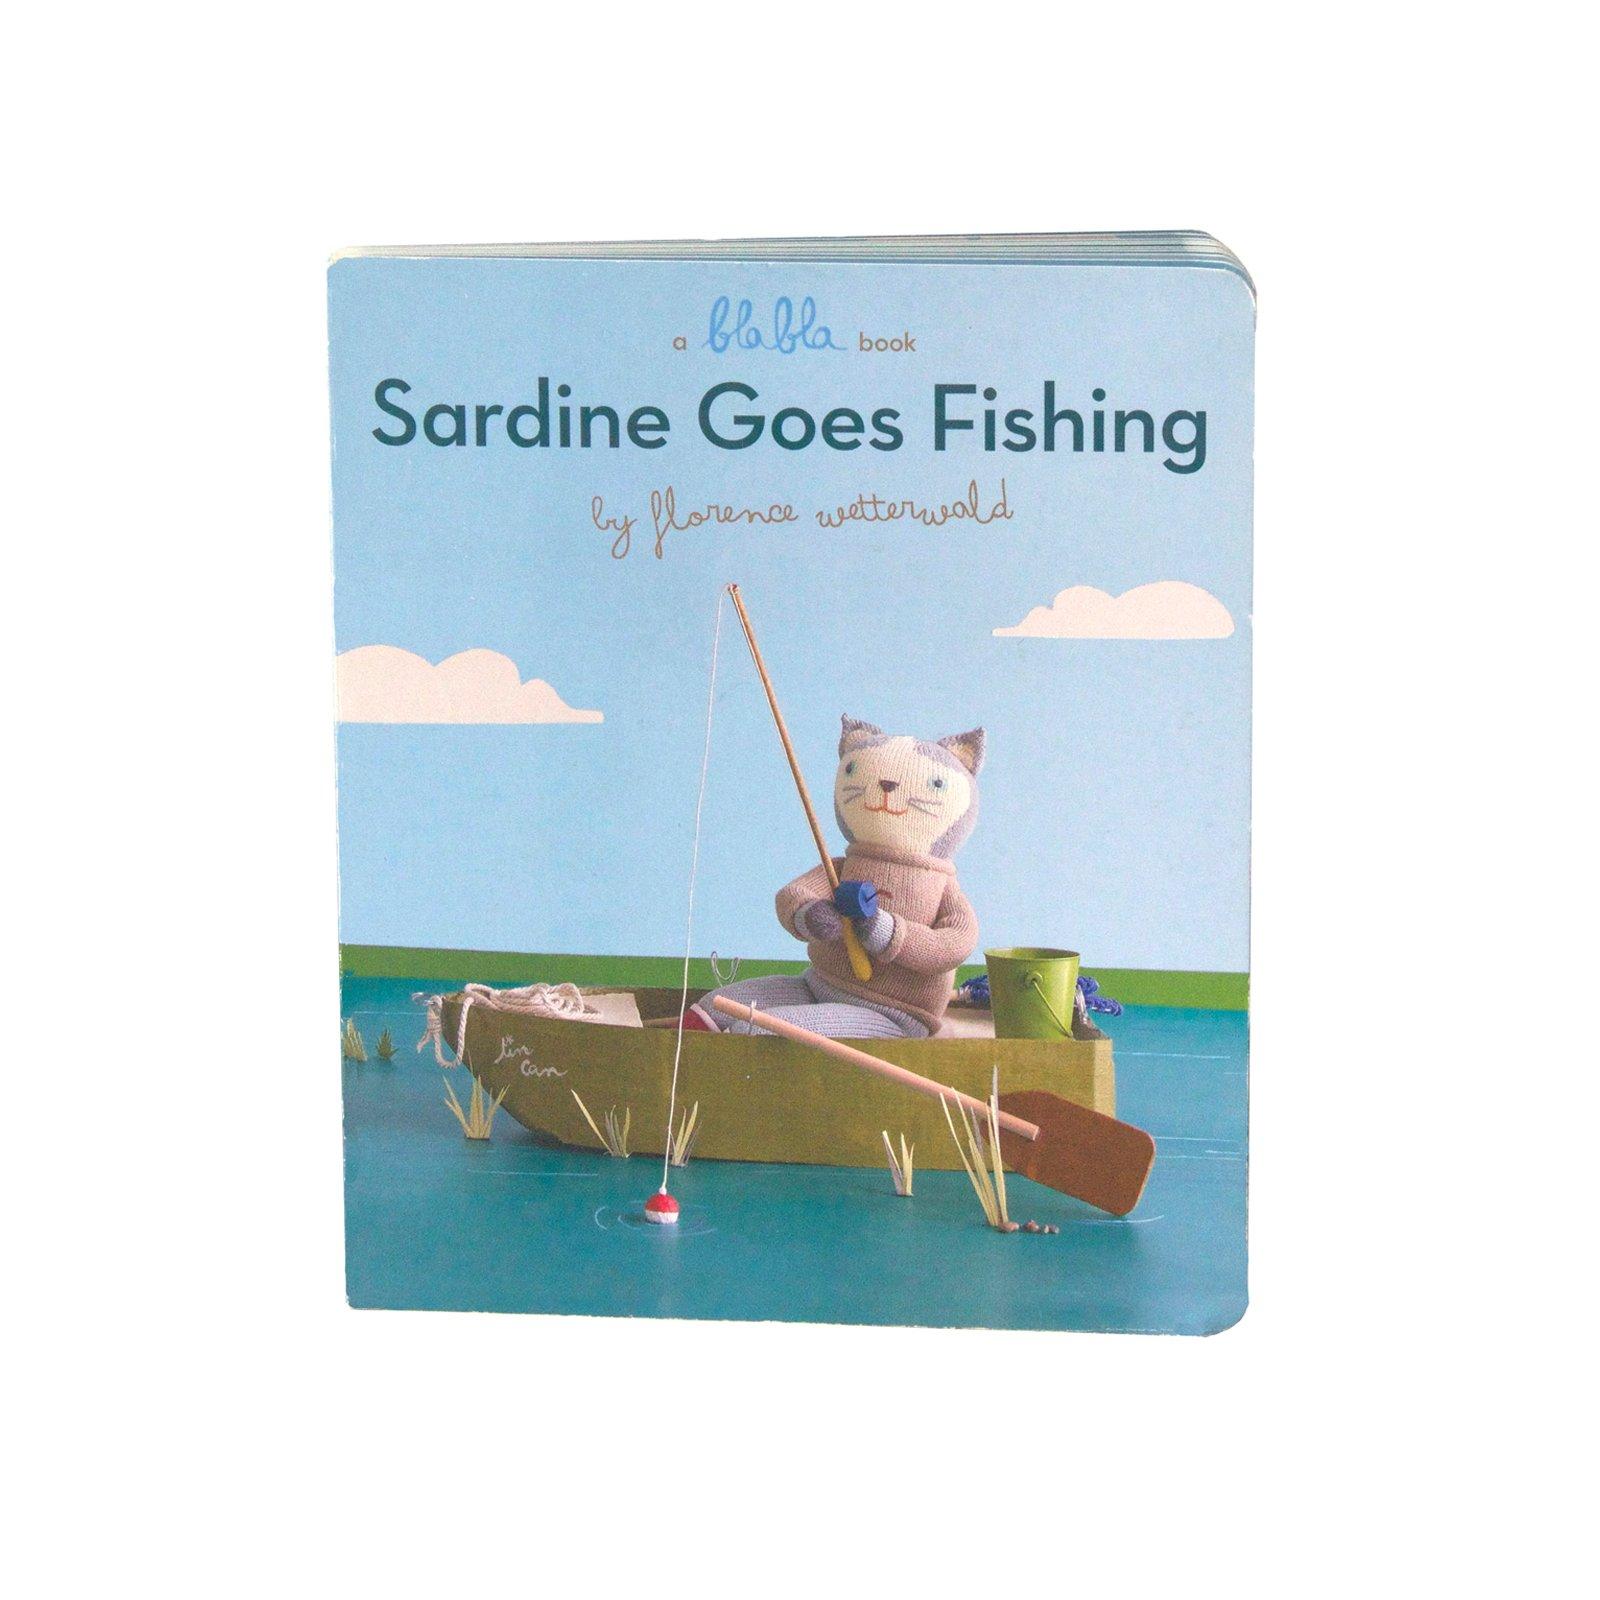 Blabla Sardine Goes Fishing Book